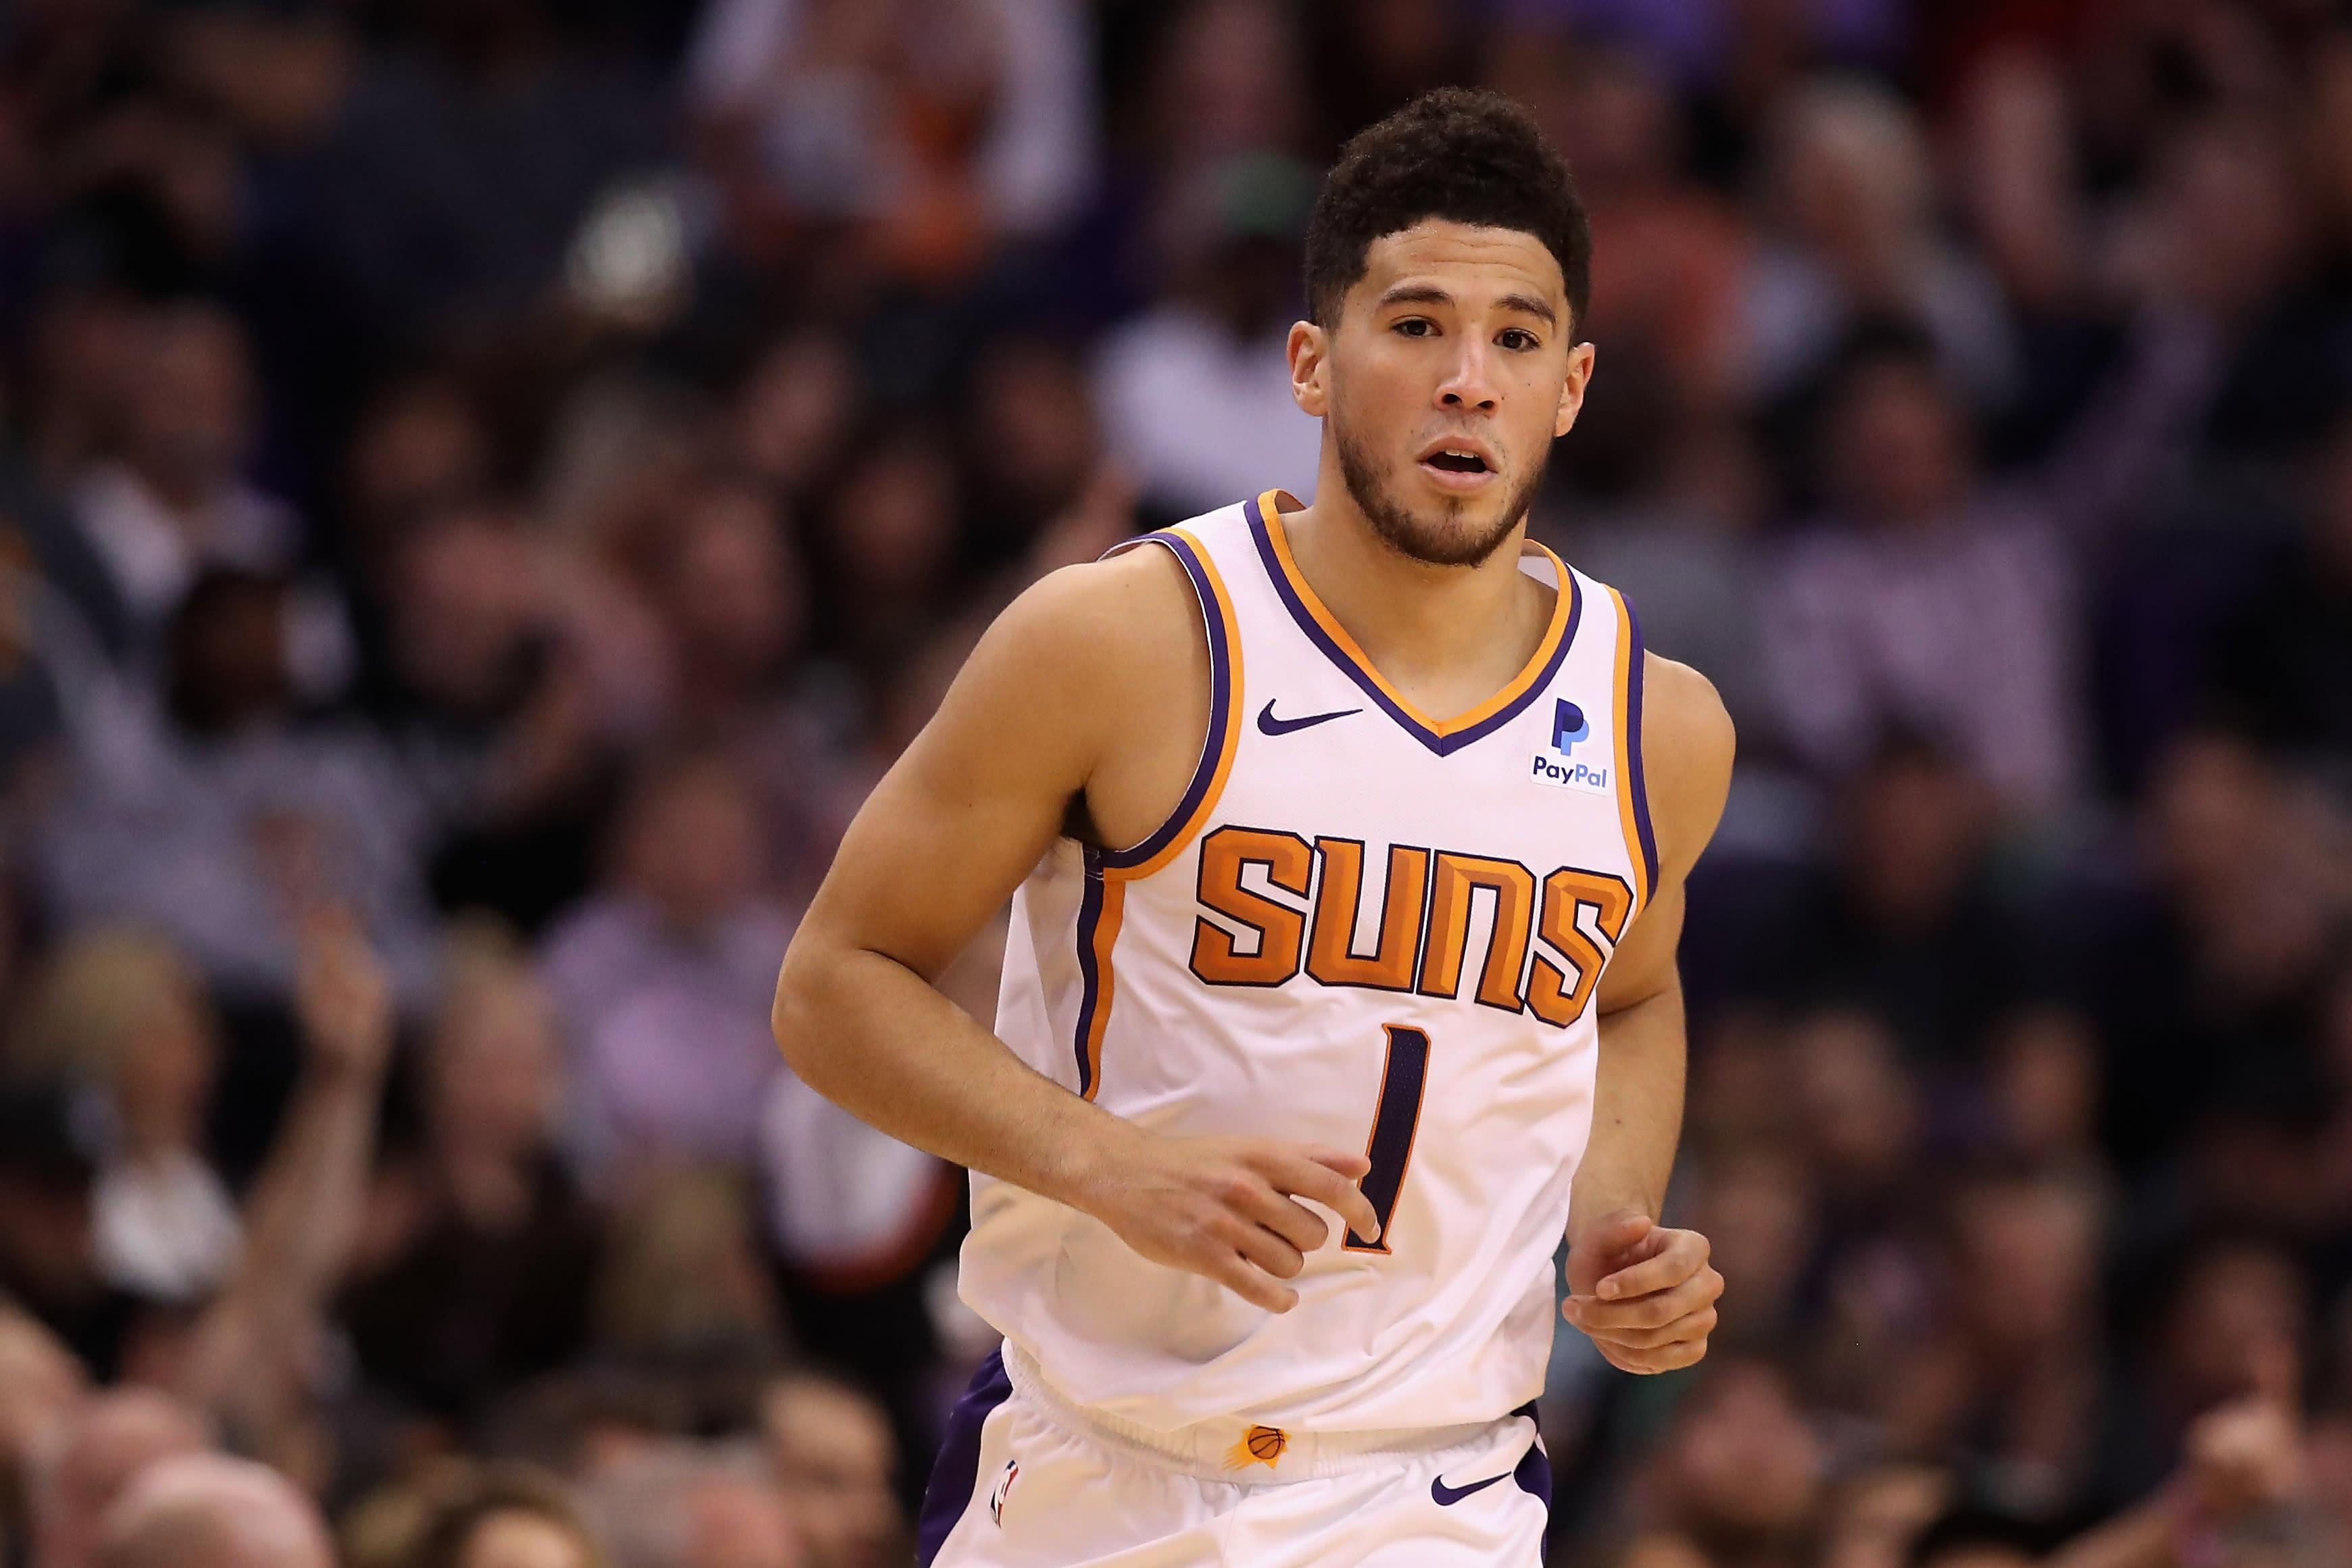 2019 Yahoo Fantasy Basketball Week 6 Start 'Em, Sit 'Em and schedule breakdown